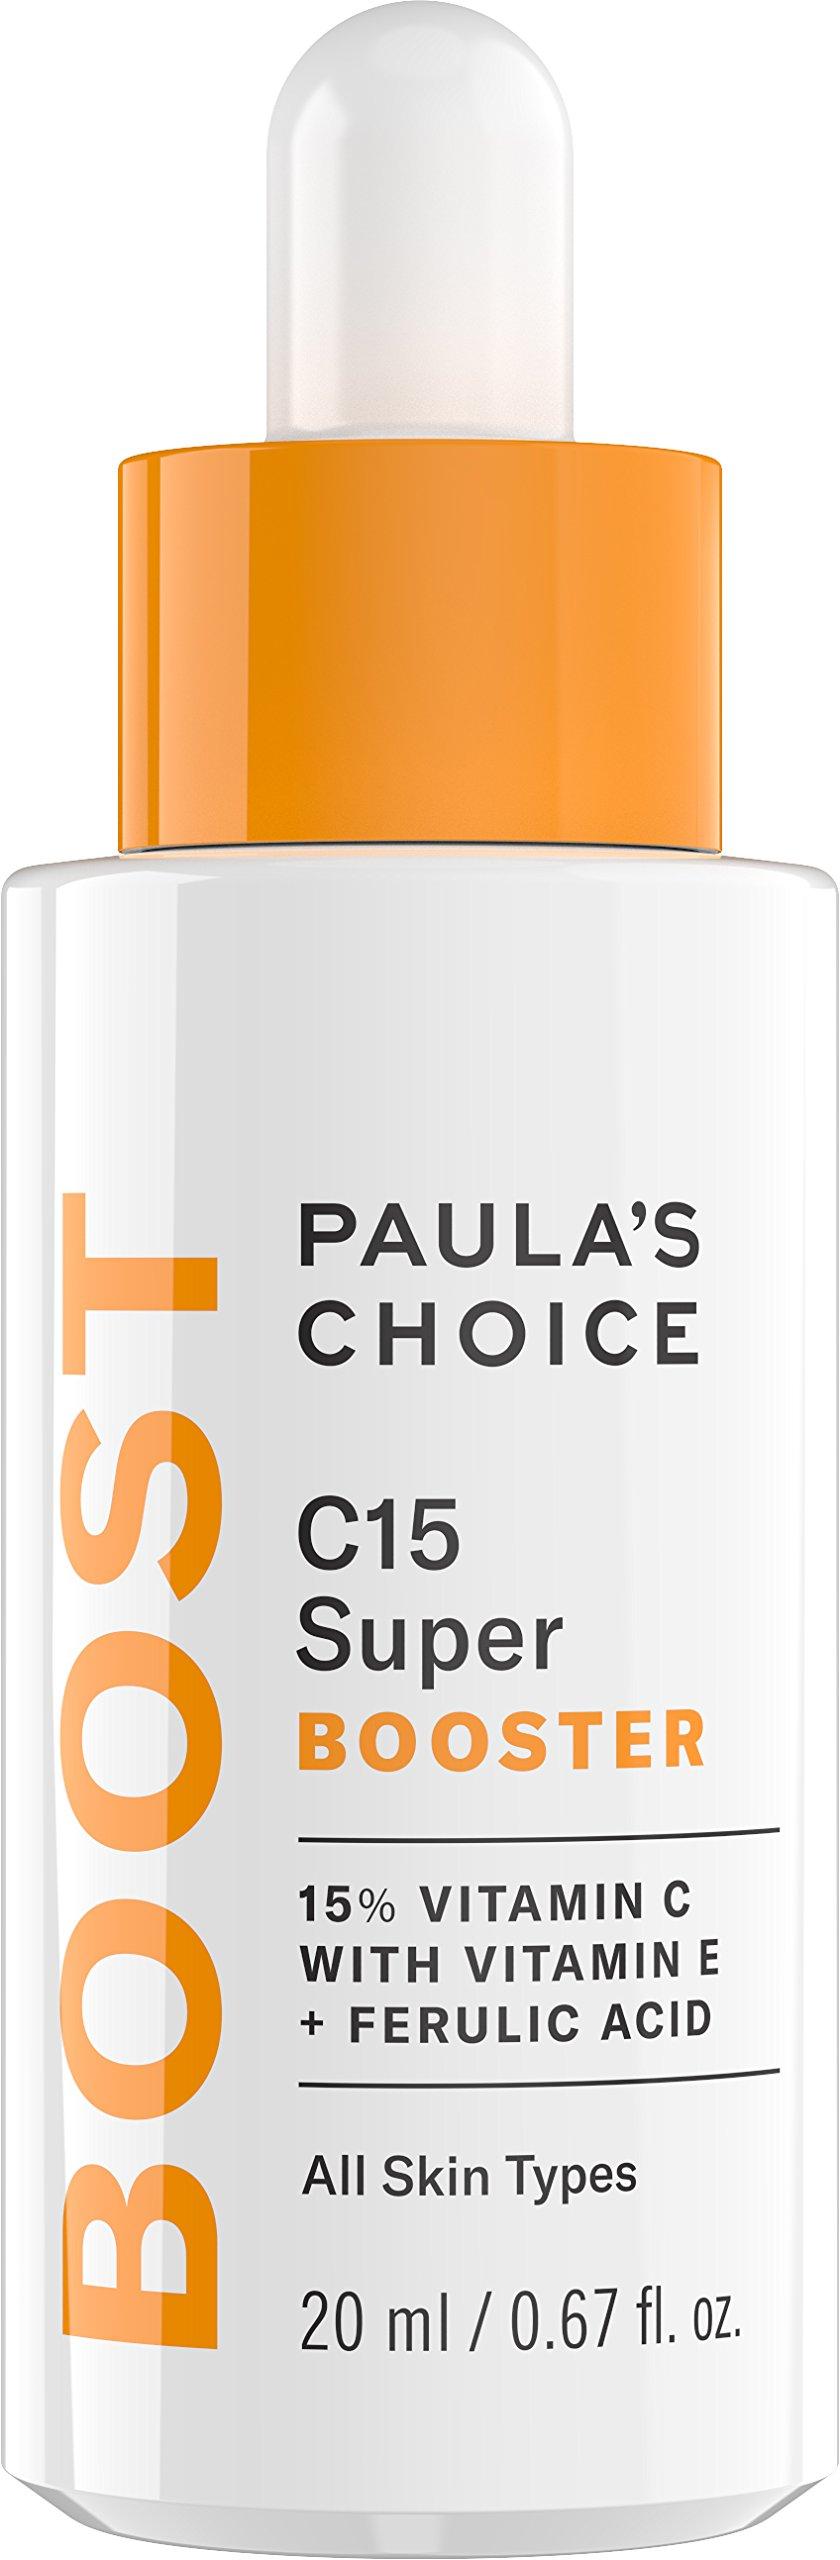 Paula's Choice BOOST C15 Super Booster, 15% Vitamin C with Vitamin E & Ferulic Acid, Skin Brightening Serum, 0.67 Ounce by Paula's Choice